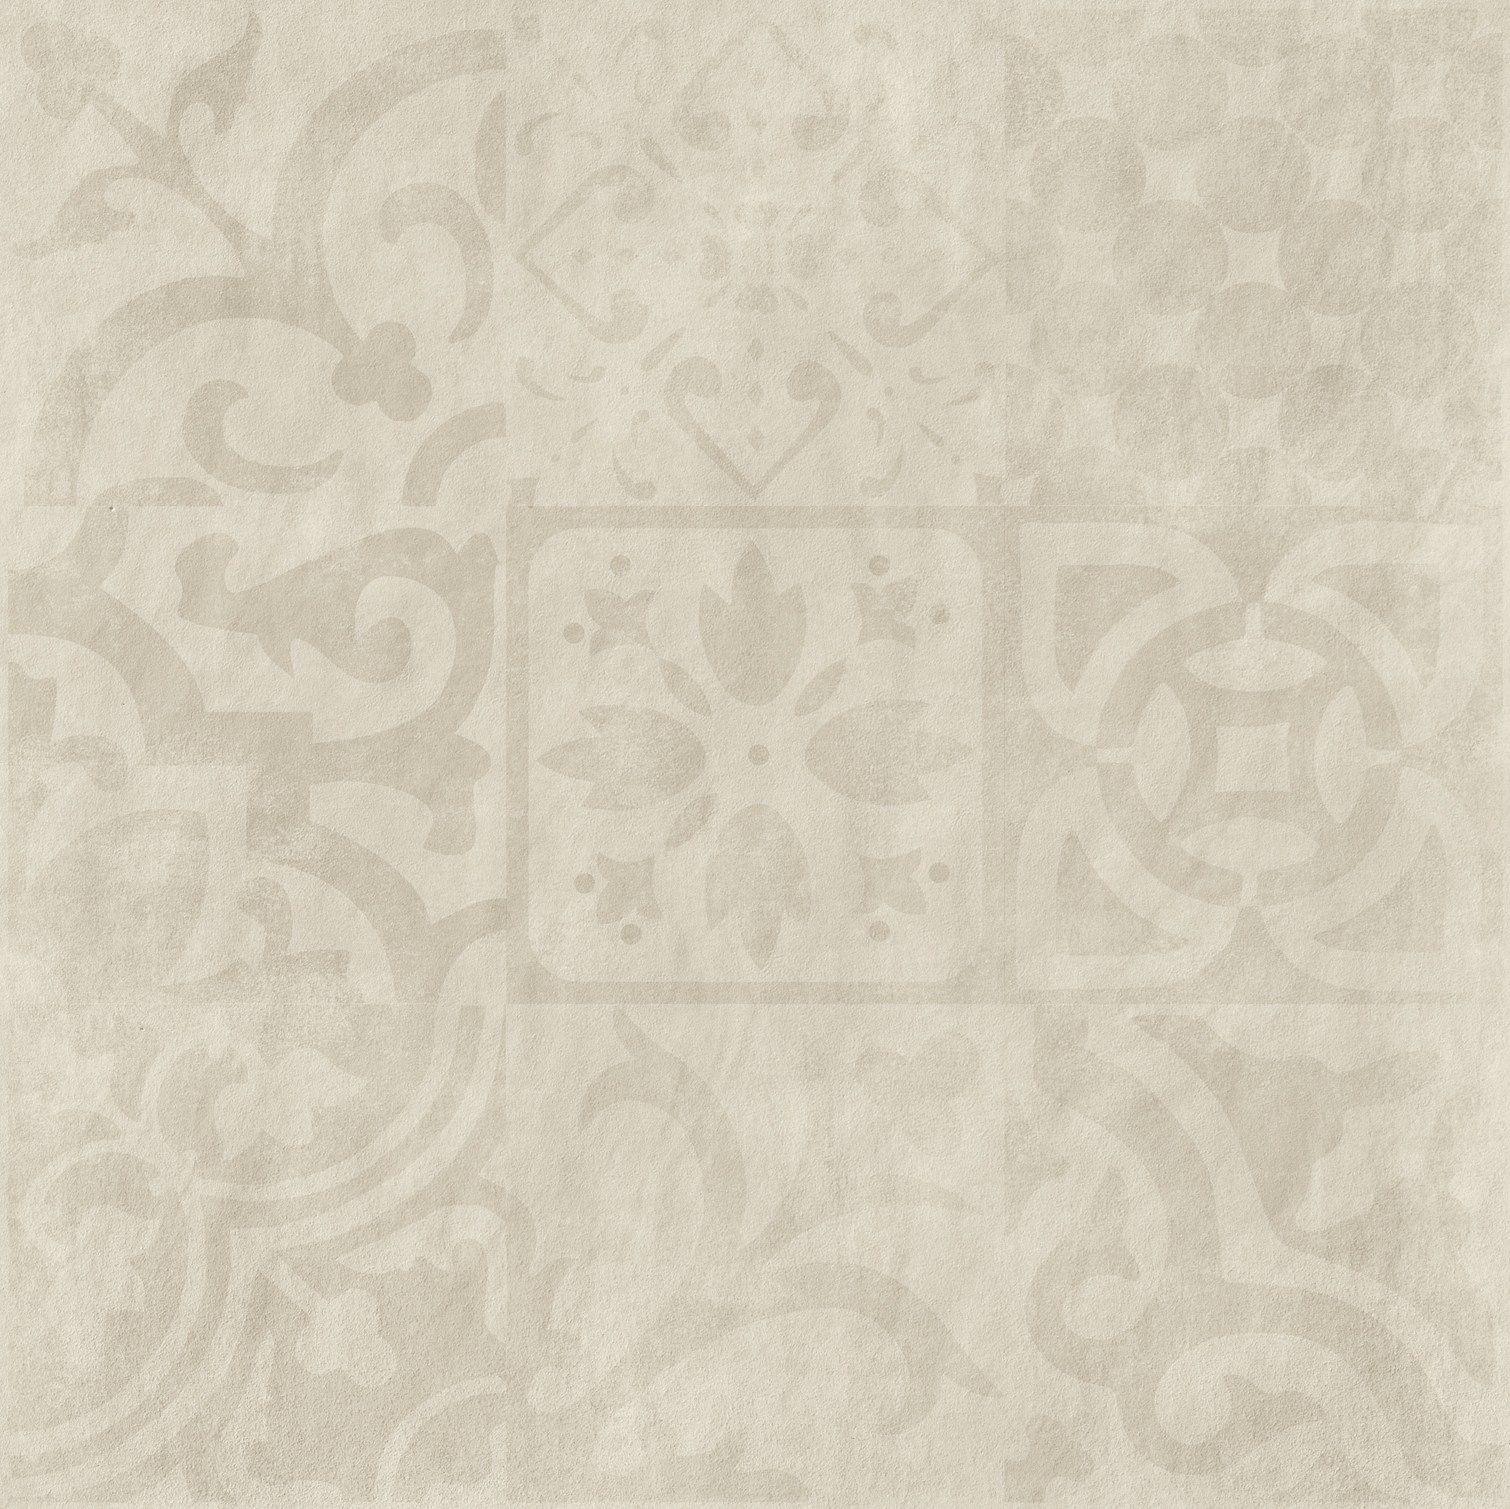 glazed stoneware floor tiles with concrete effect ground. Black Bedroom Furniture Sets. Home Design Ideas